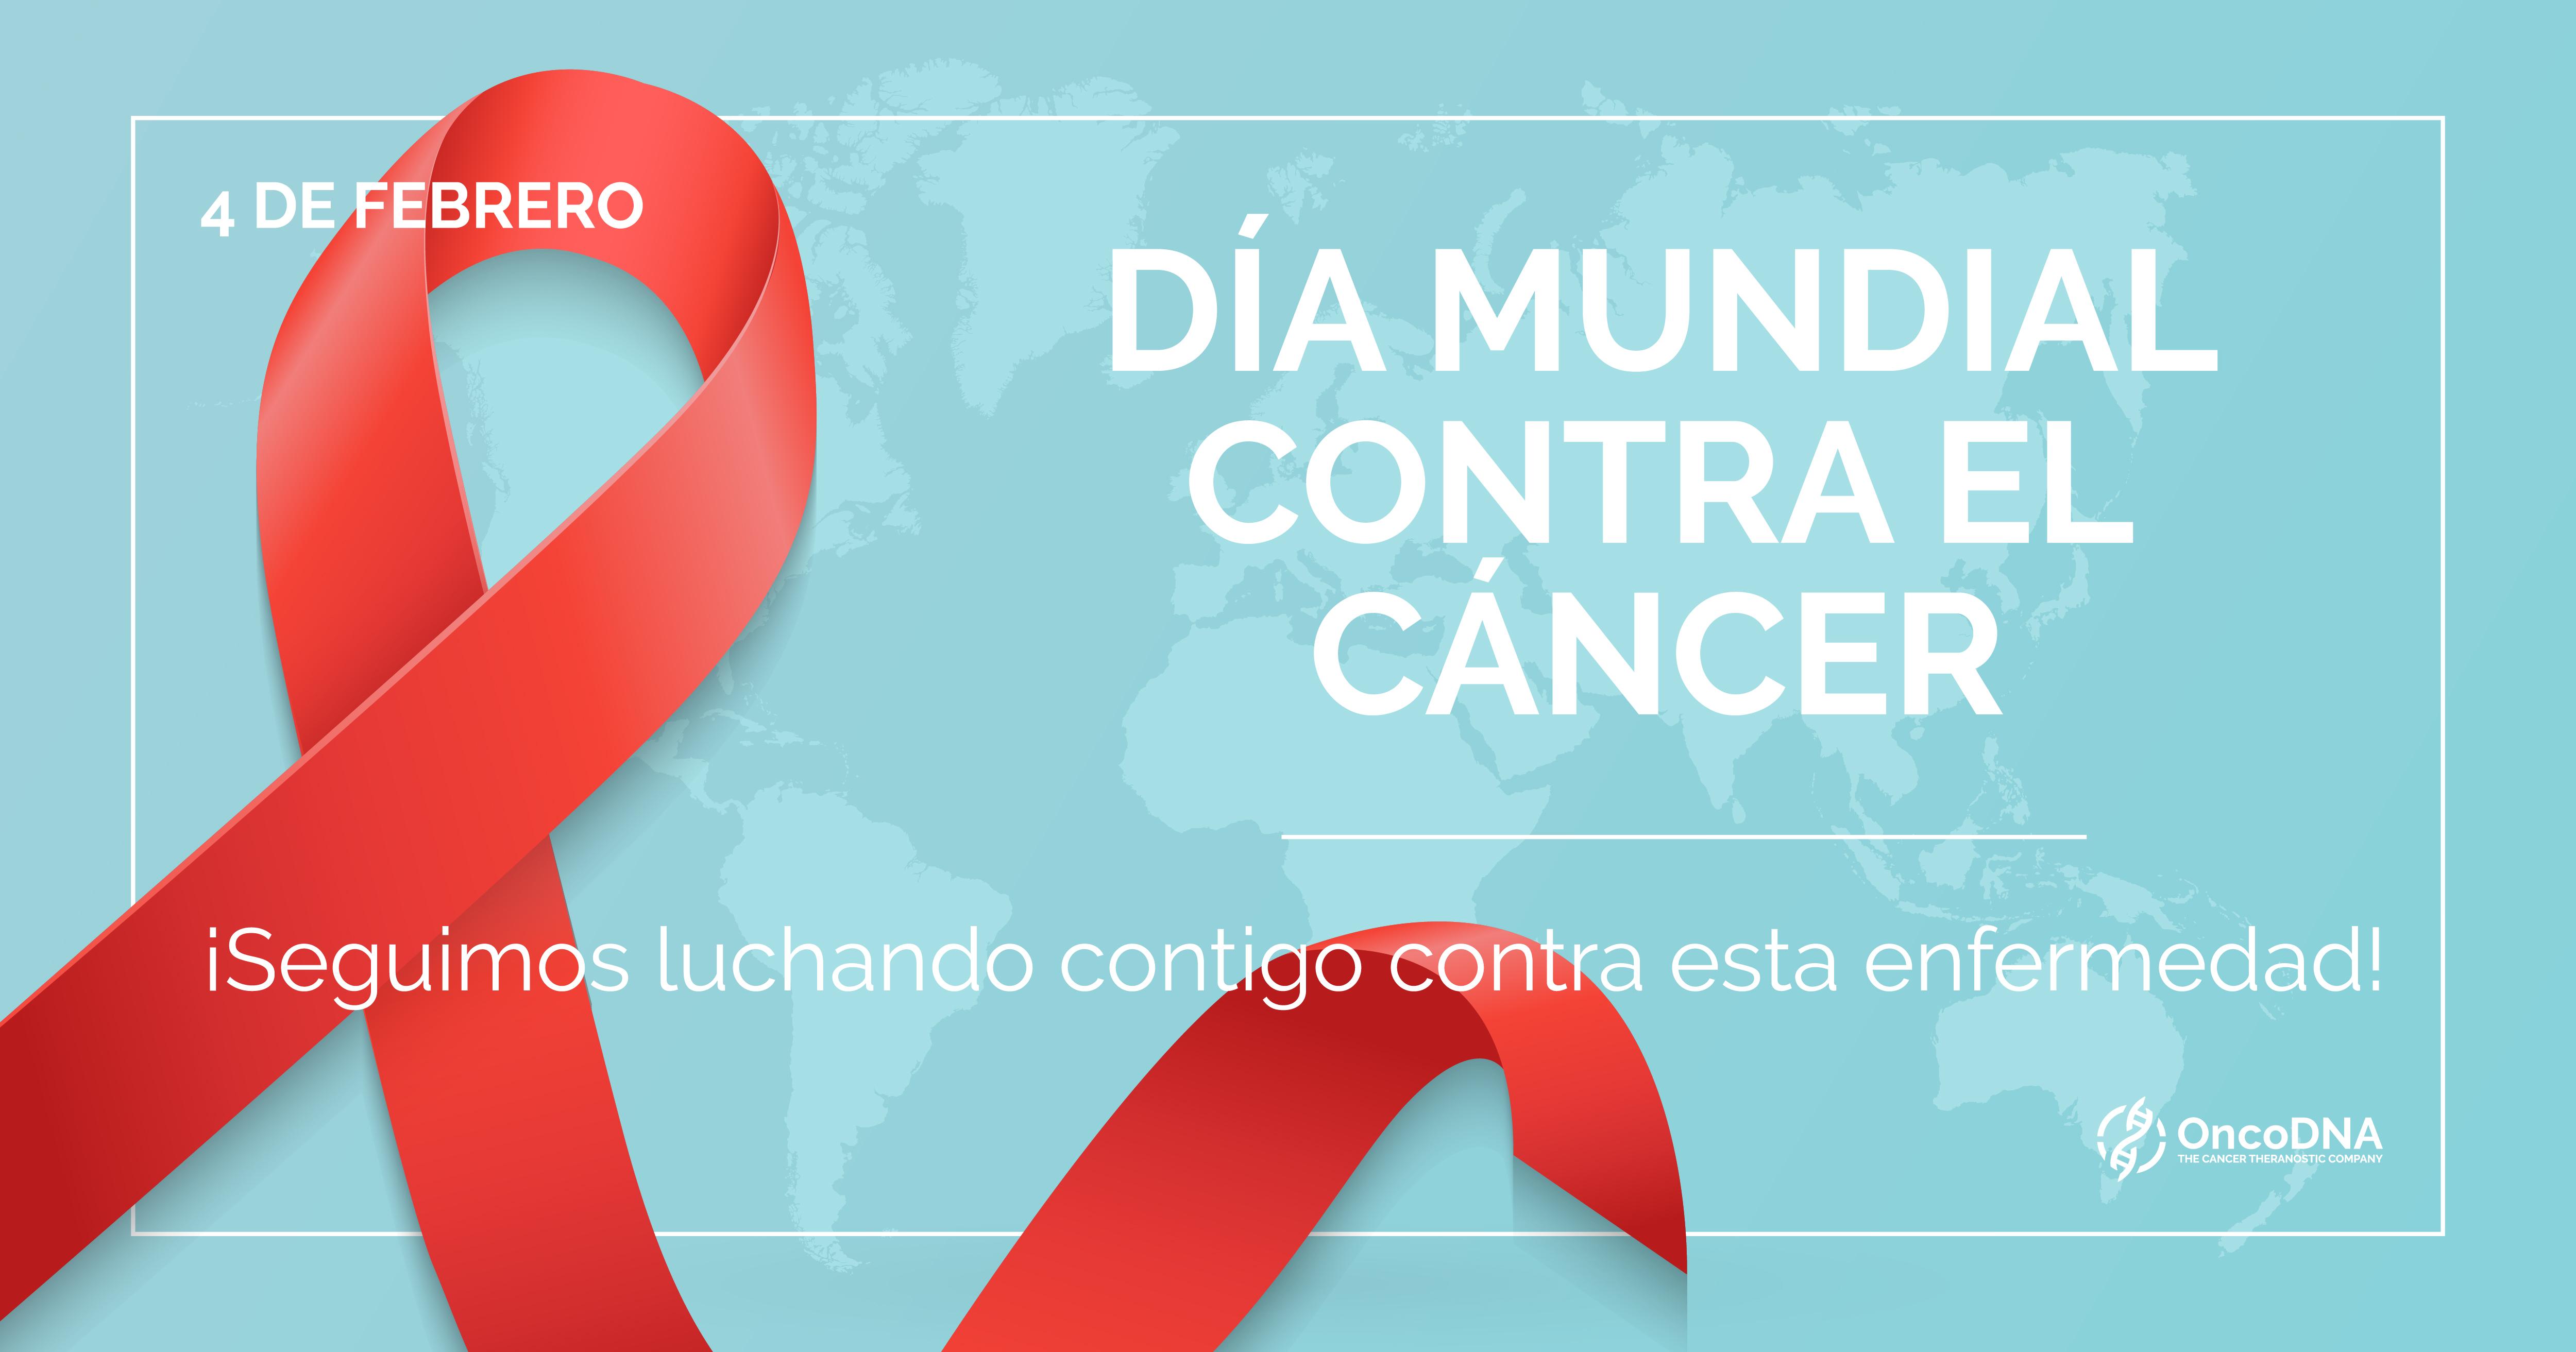 Hoy, 4 de Febrero, Dia Mundial Contra el Cáncer.